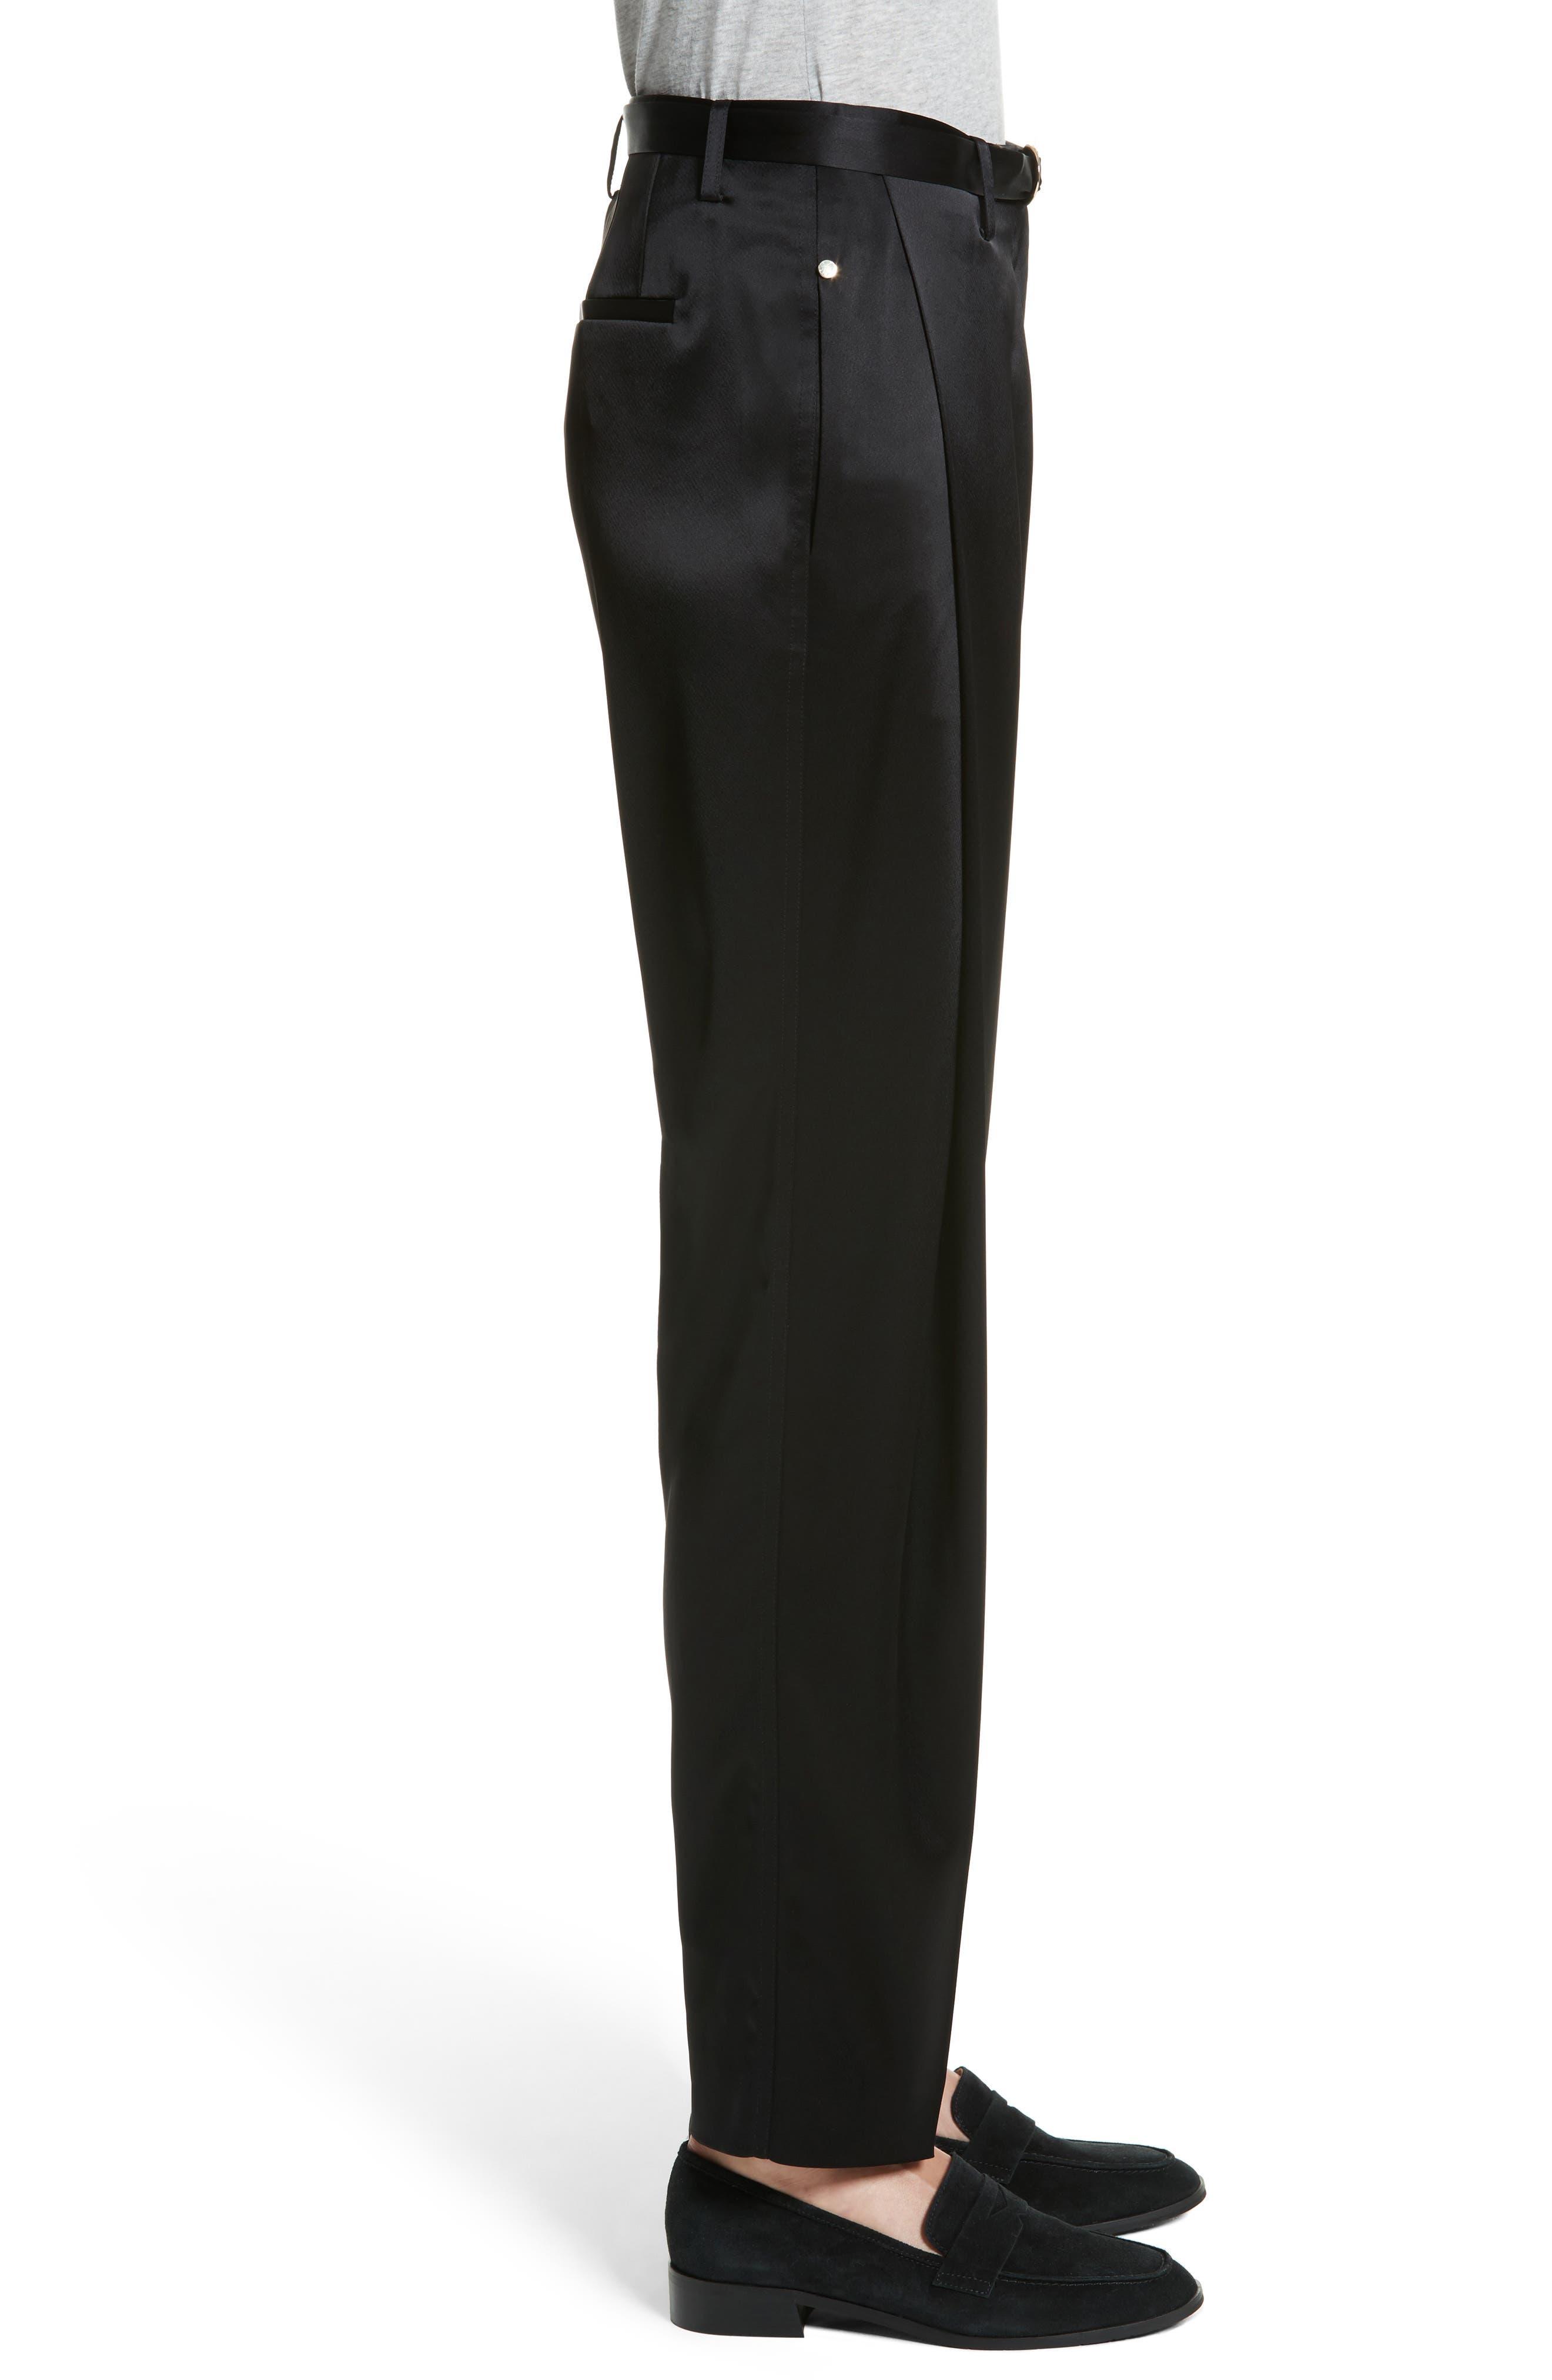 Nassau Reverie Satin Cloth Pants,                             Alternate thumbnail 3, color,                             001